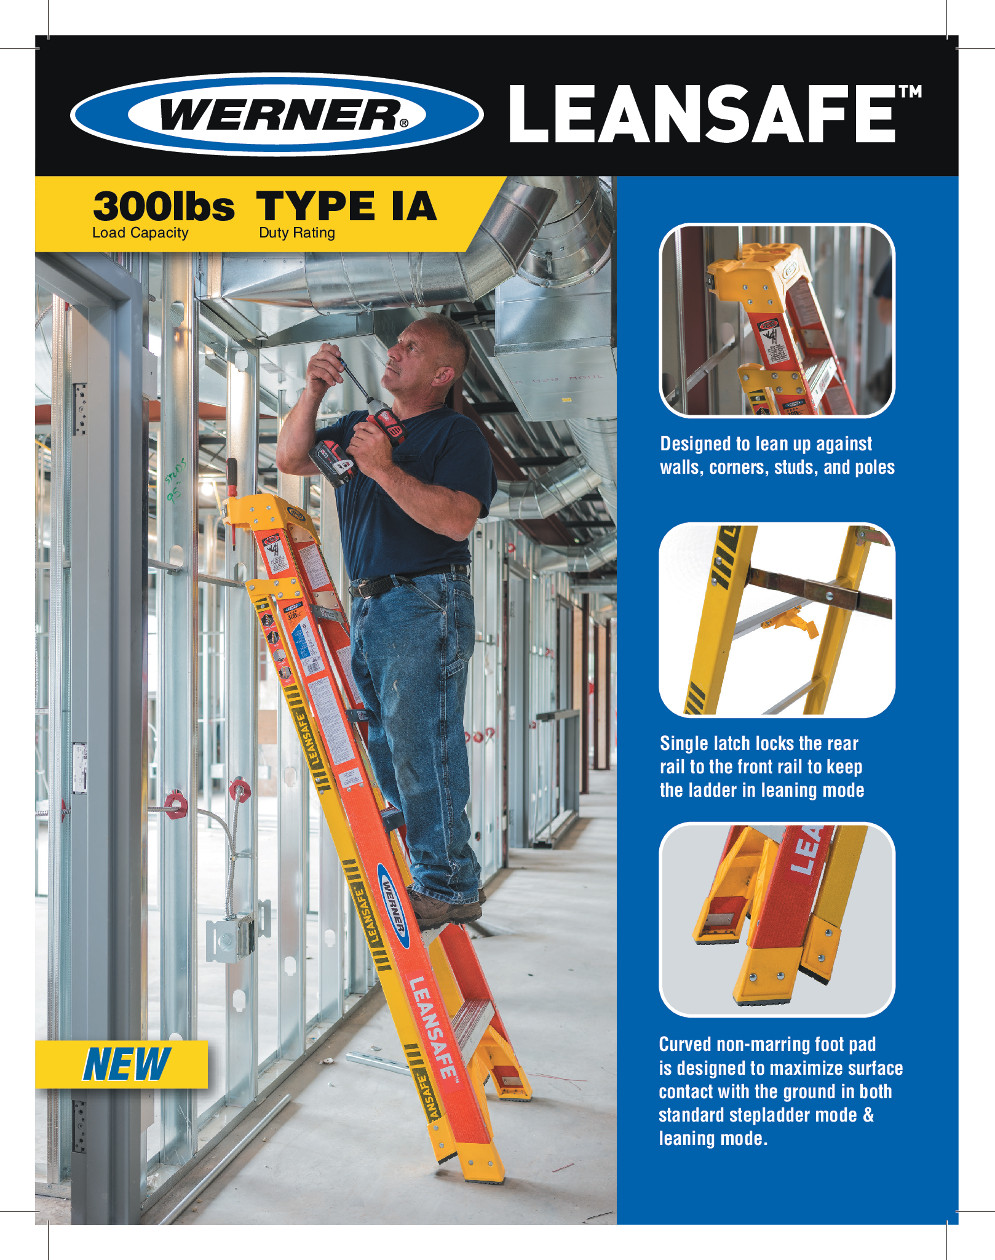 gm7522-l6200-leansafe-ladder-sellsheet-hires-1260x1260.jpg